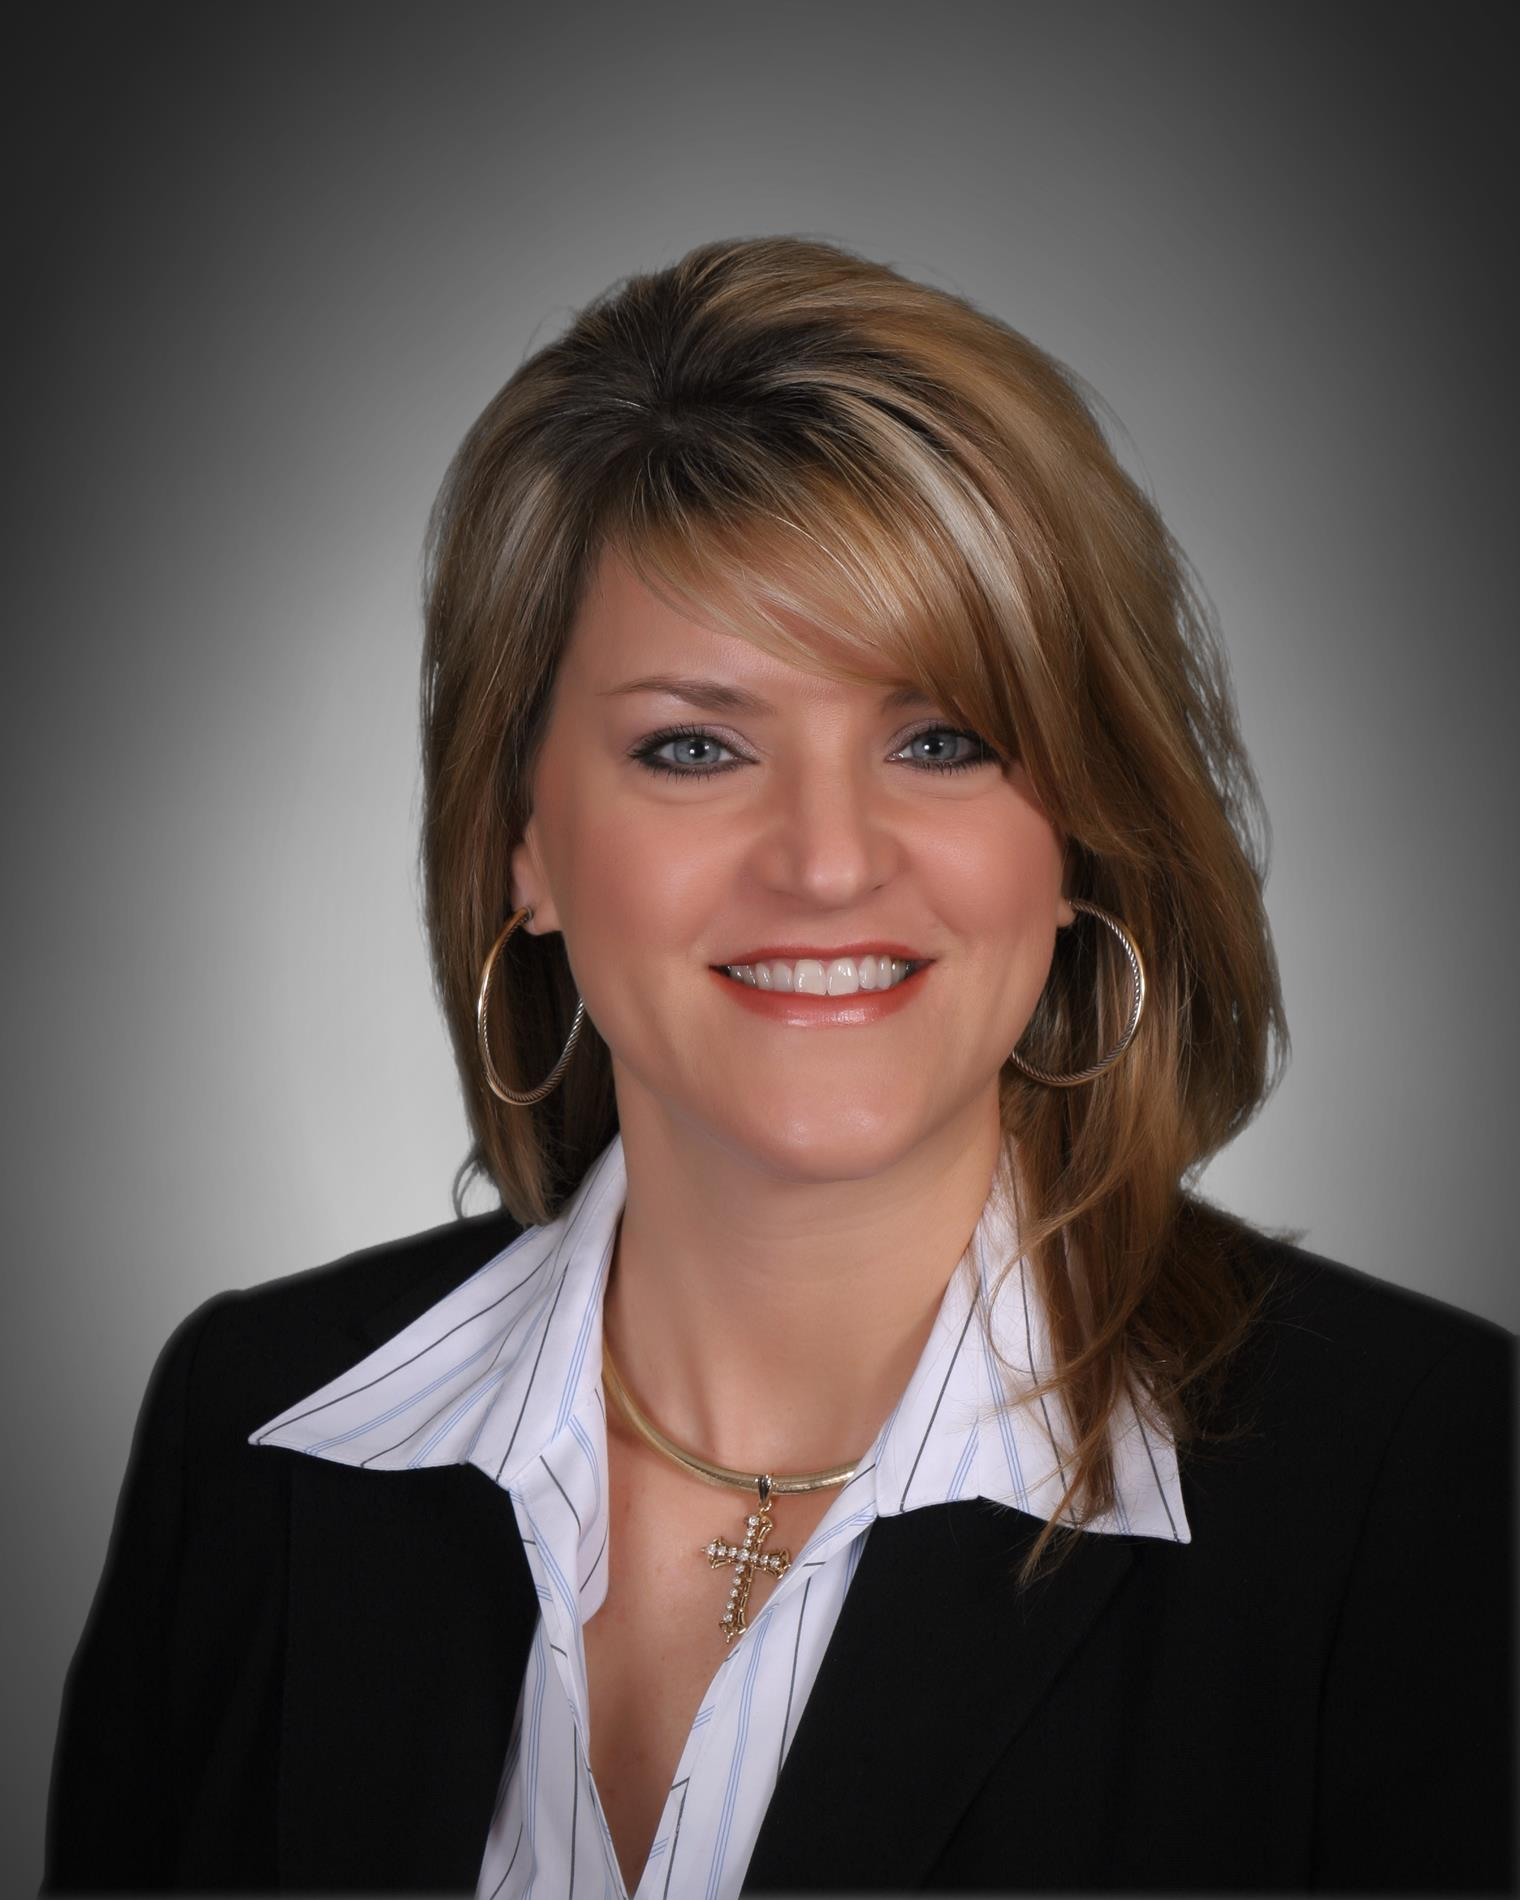 Lucy Hasselman, Assistant Superintendent